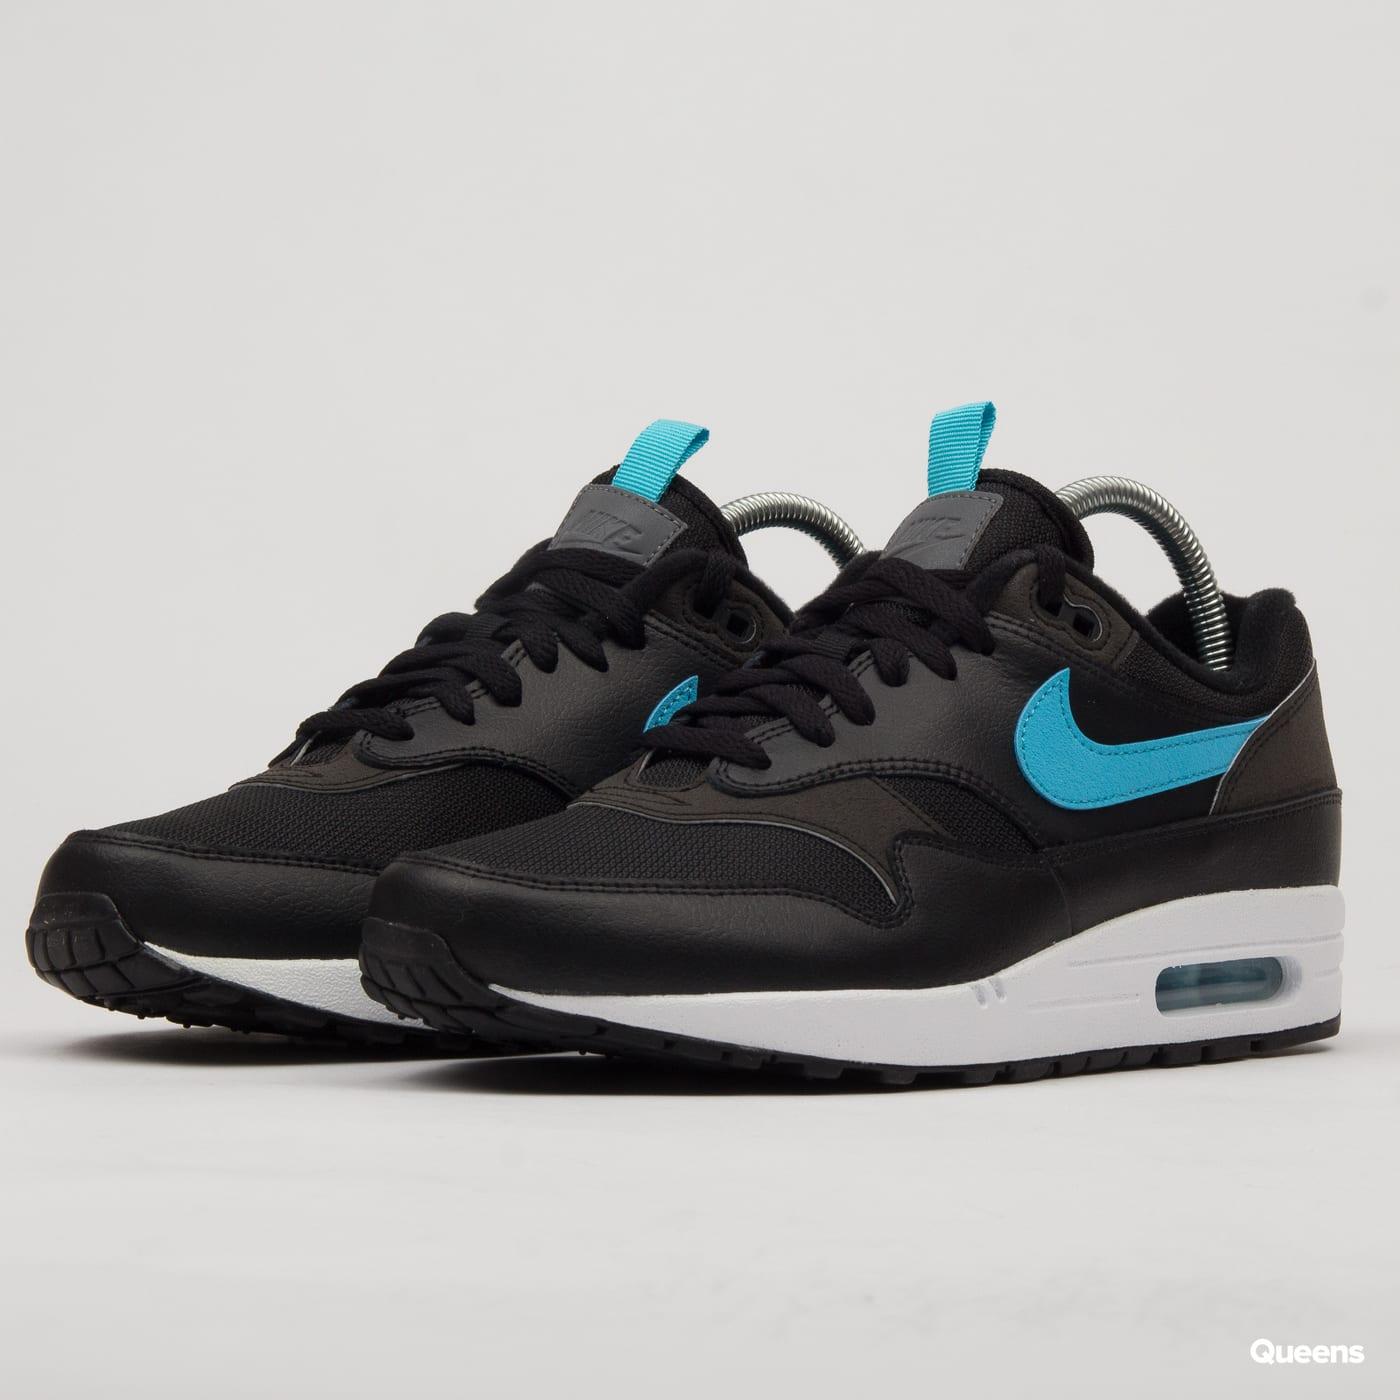 Sneakers Nike Air Max 1 SE black / blue